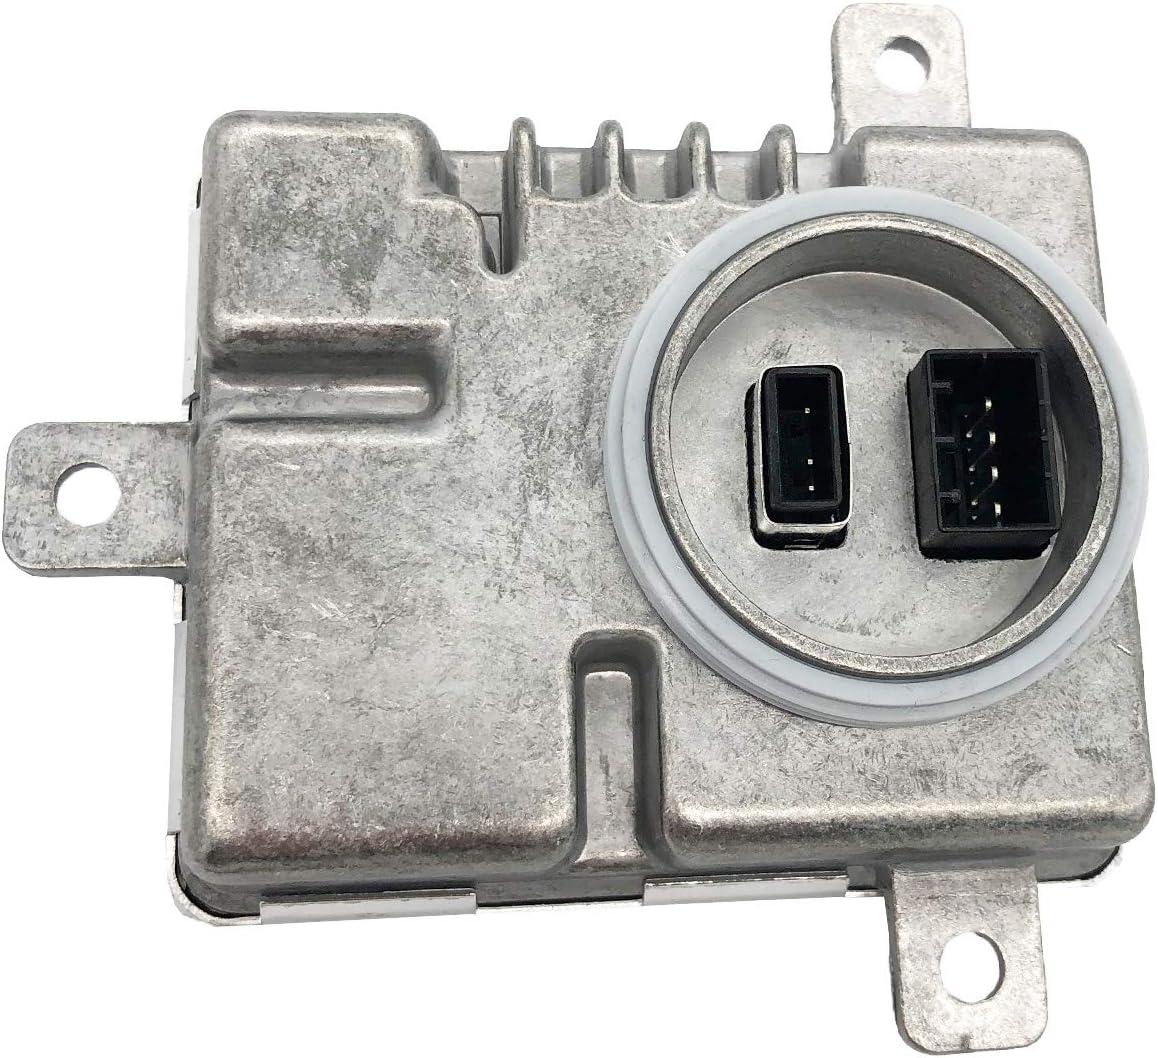 W003T22071 Replaces 8K0941597C GERMBAN 8K0941597 Xenon HID Headlight Ballast Control Unit Fits for Audi A1A3 A4 A5 A6 A7 A8 VW Jetta Golf